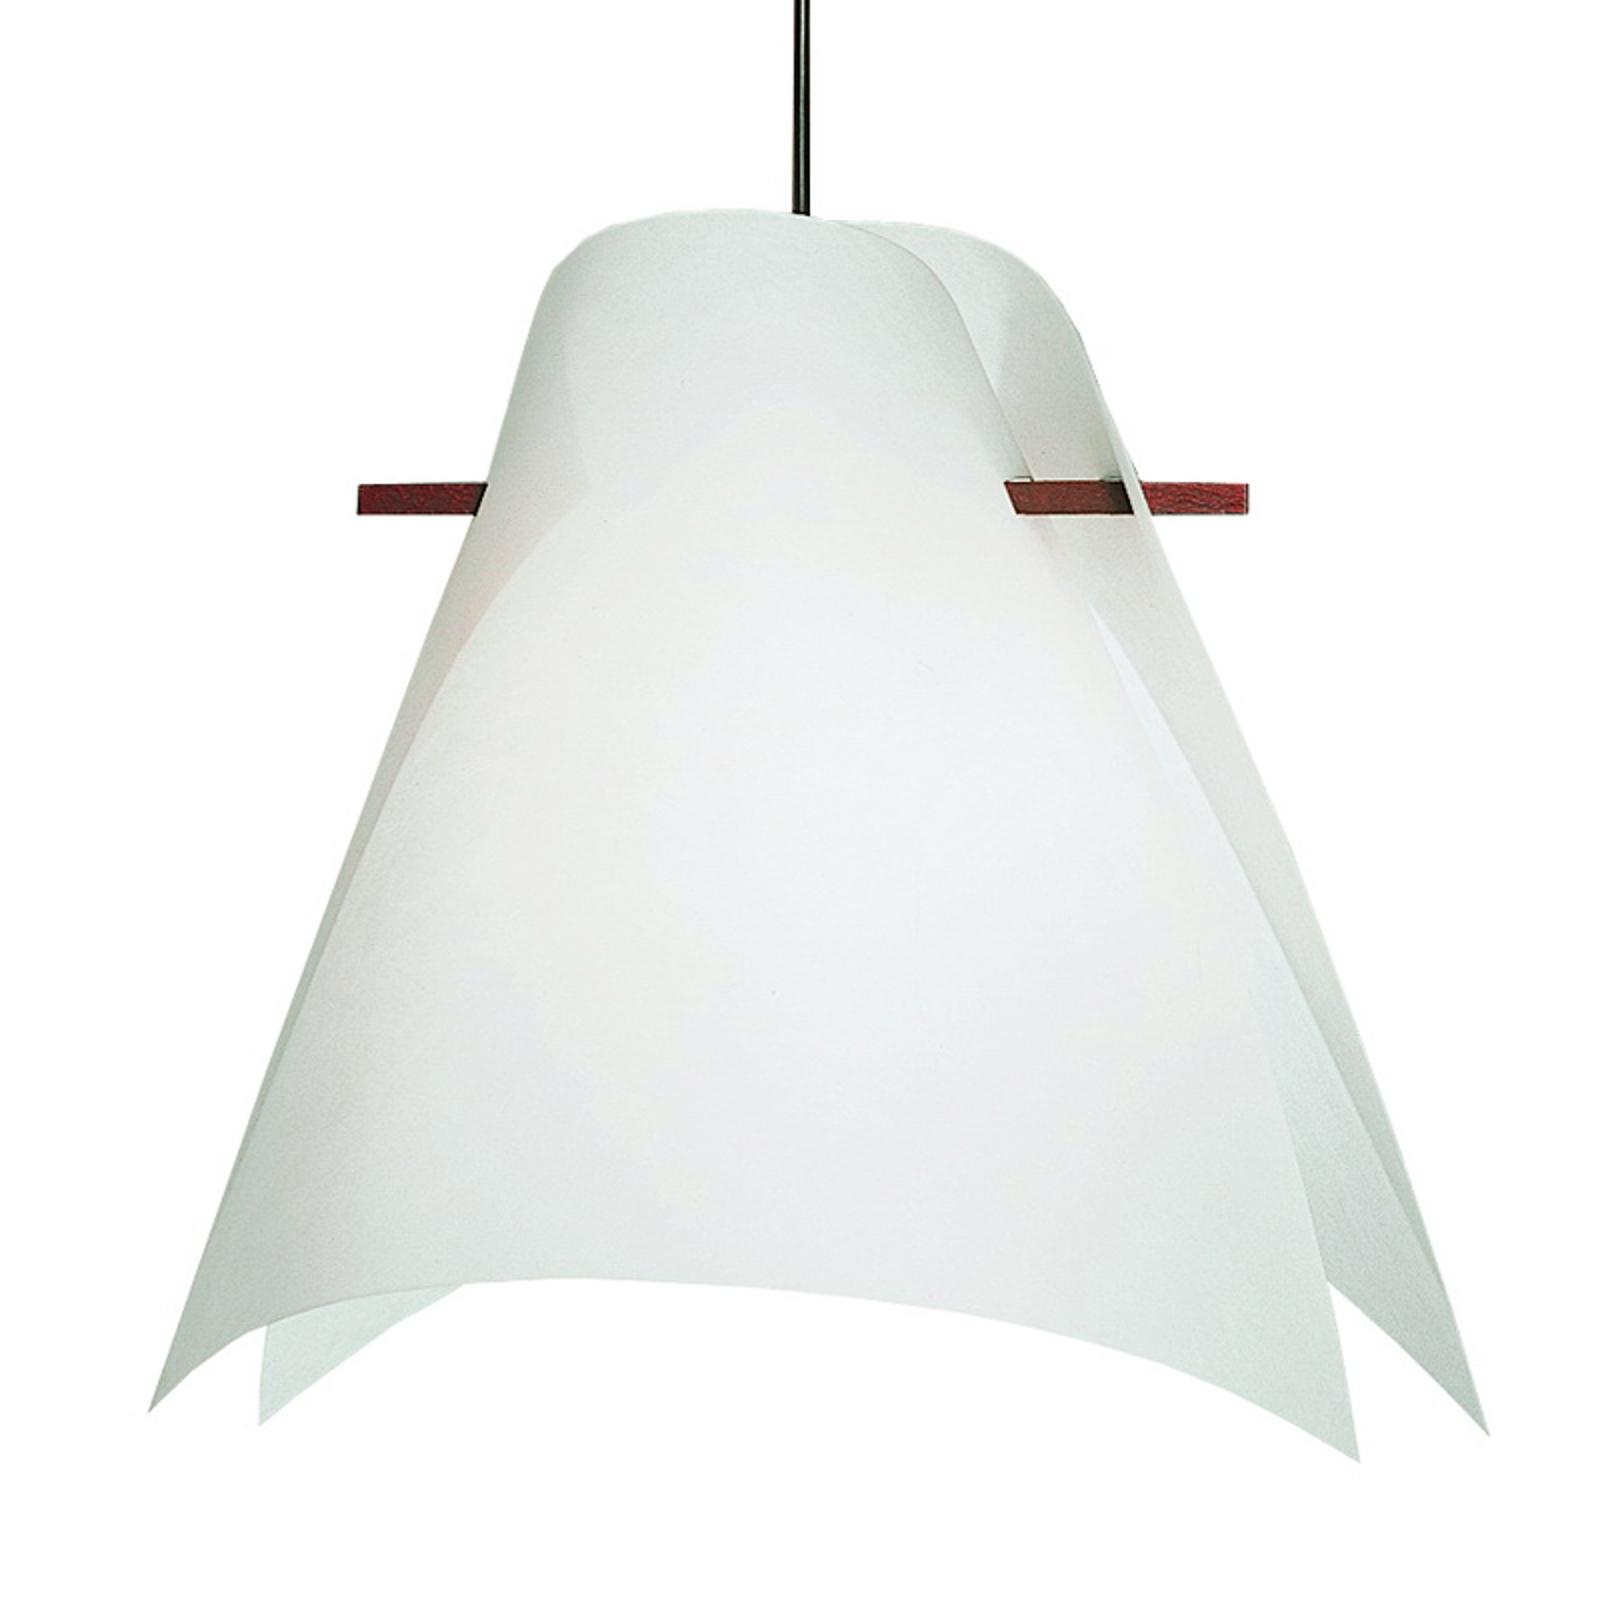 Pendant light PLAN B_2600050_1